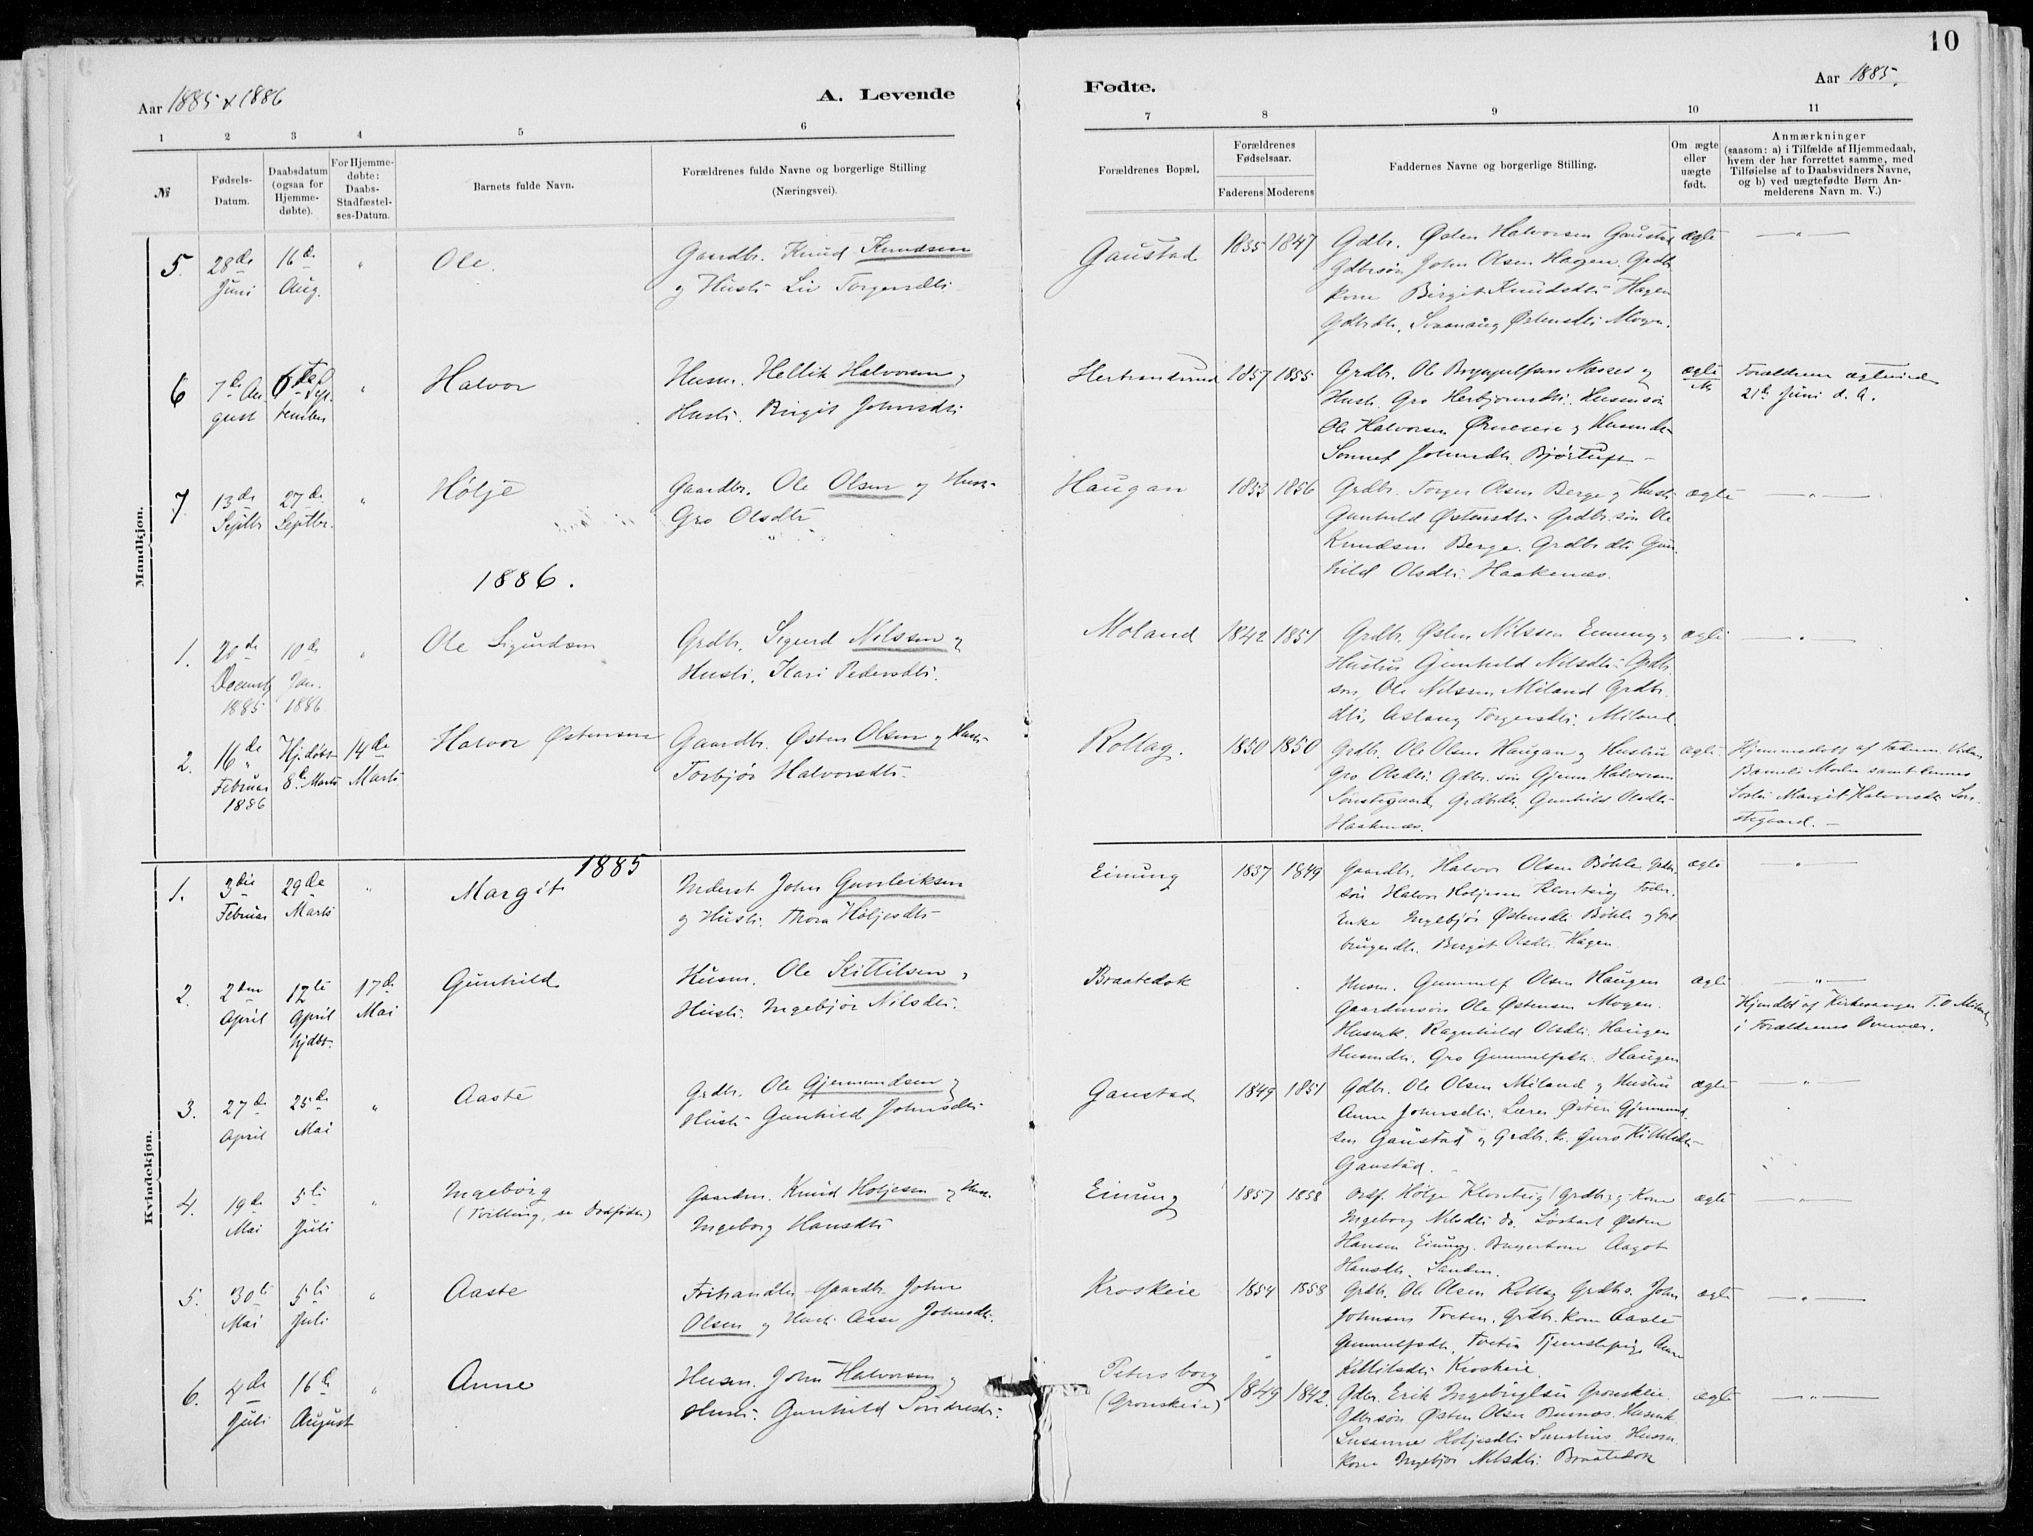 SAKO, Tinn kirkebøker, F/Fb/L0002: Ministerialbok nr. II 2, 1878-1917, s. 10